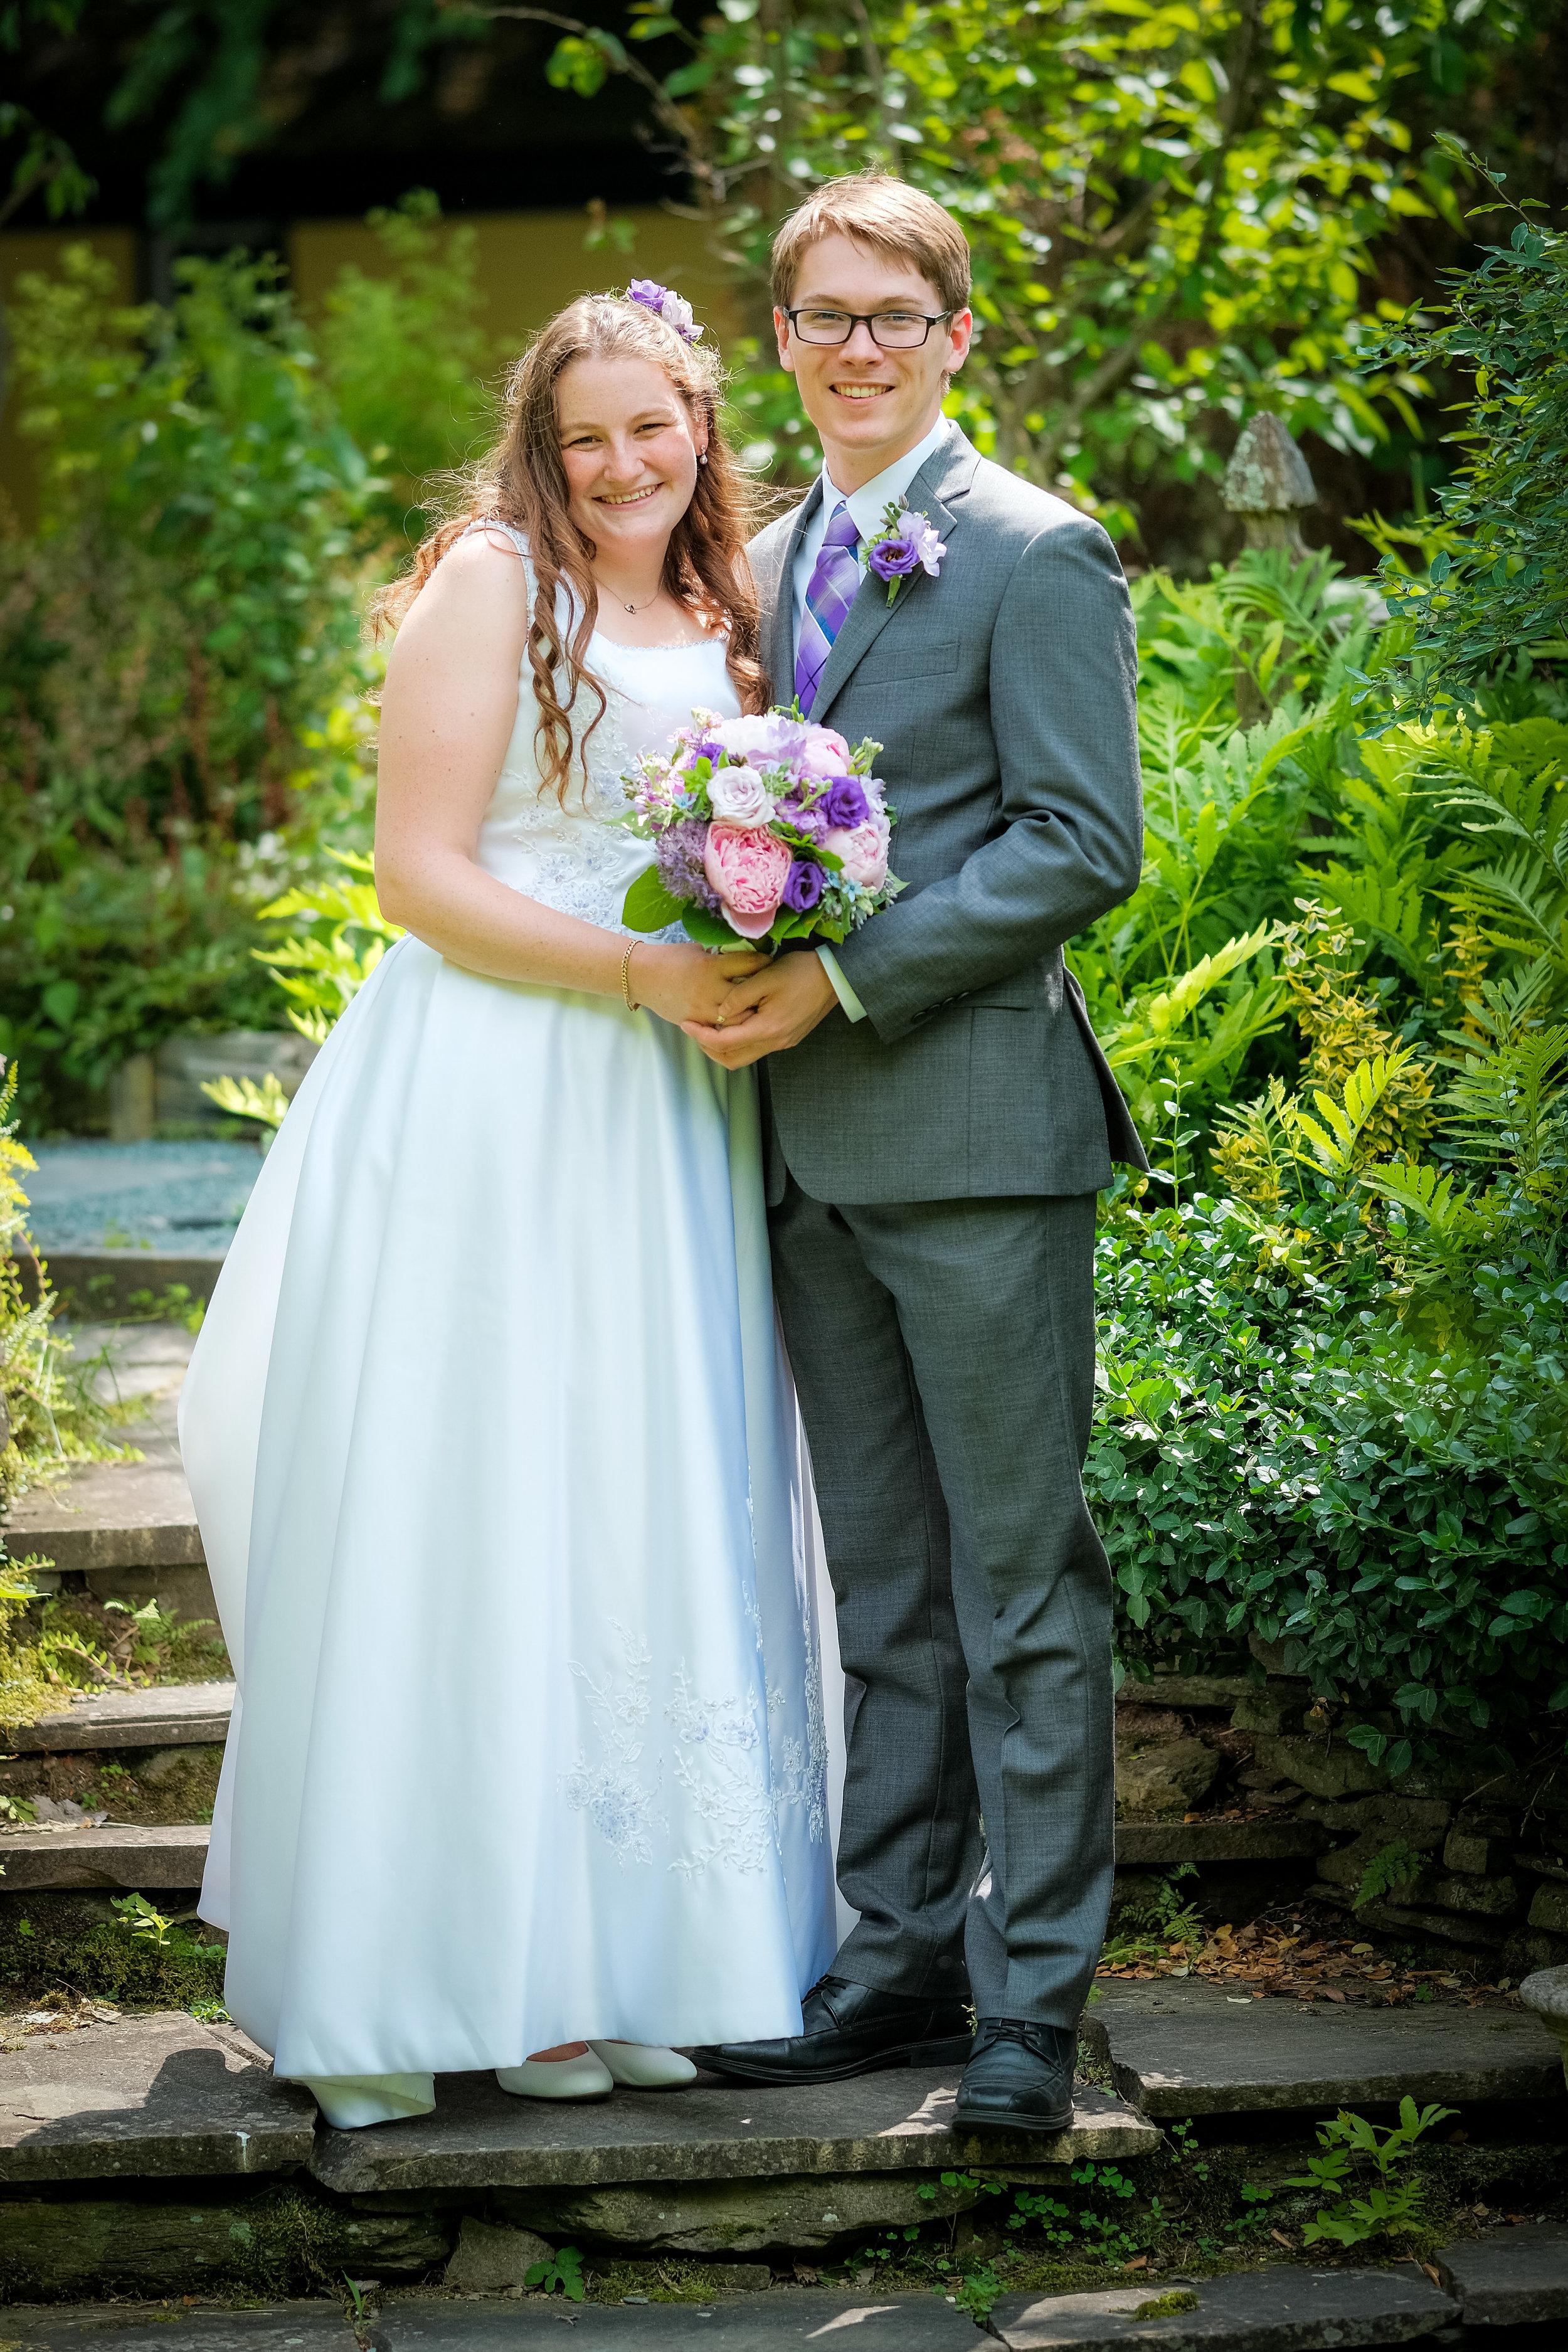 Vermont-Lilac-Inn-Wedding-Photography-440.jpg